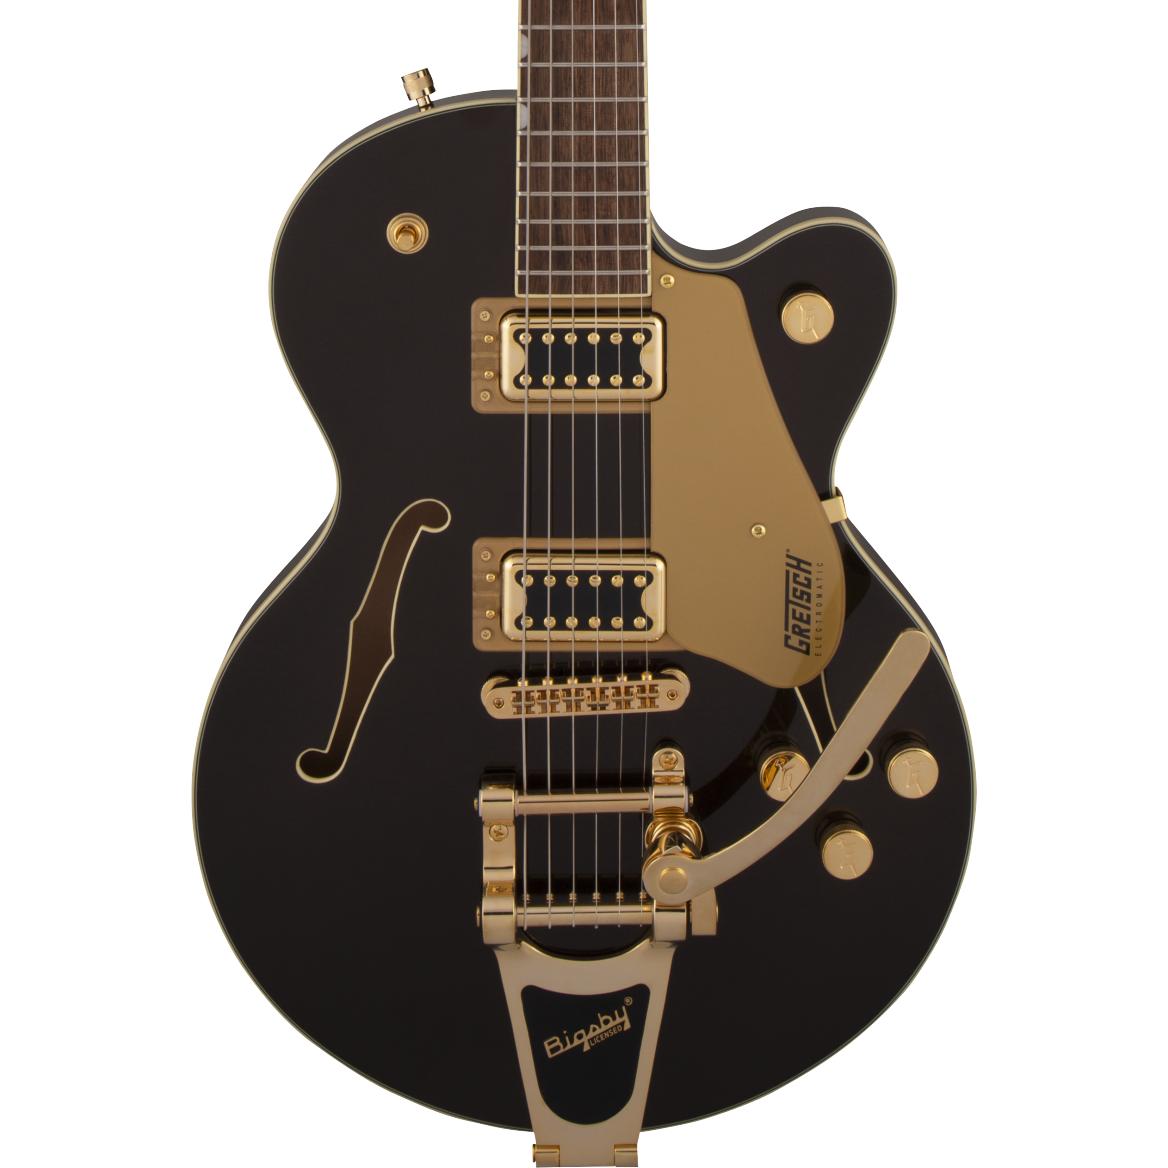 Gretsch G5655TG Electromatic Center Block Jr. - Black